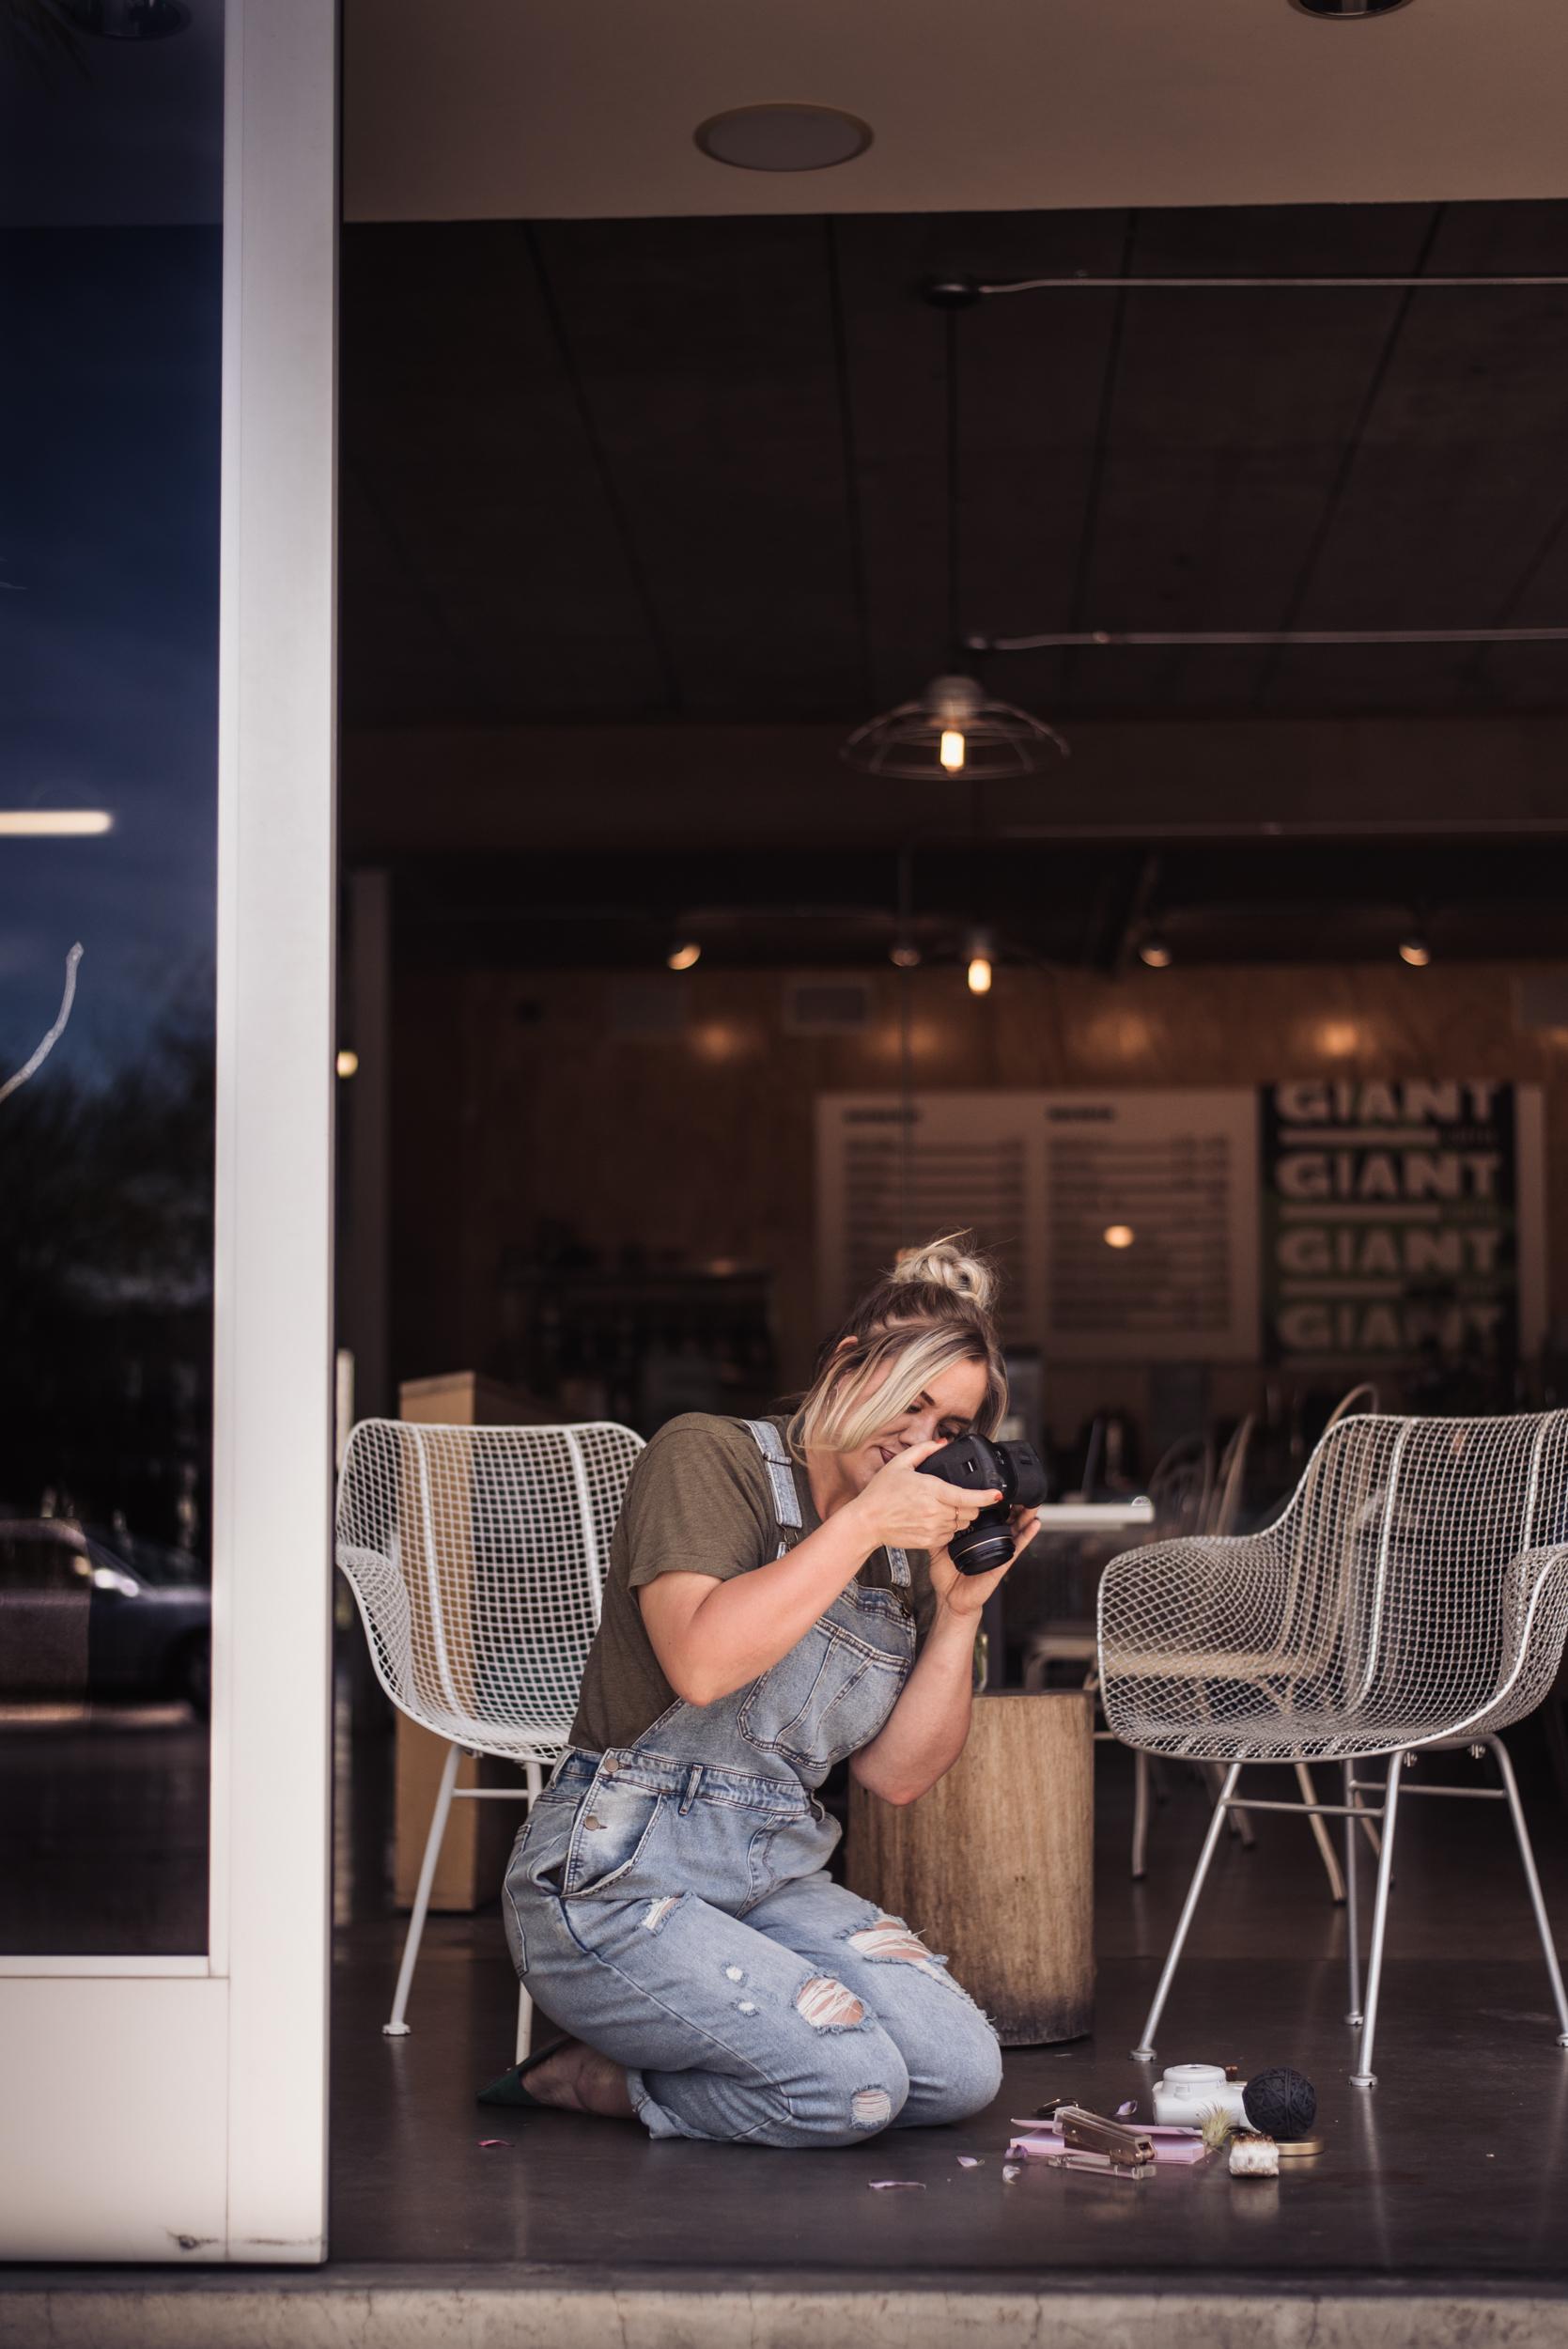 7 Hacks to Capture Better Instagram Photos, flatlay, flatlay photography, giant coffee phoenix arizona-www.rachelsmak.com2.jpg